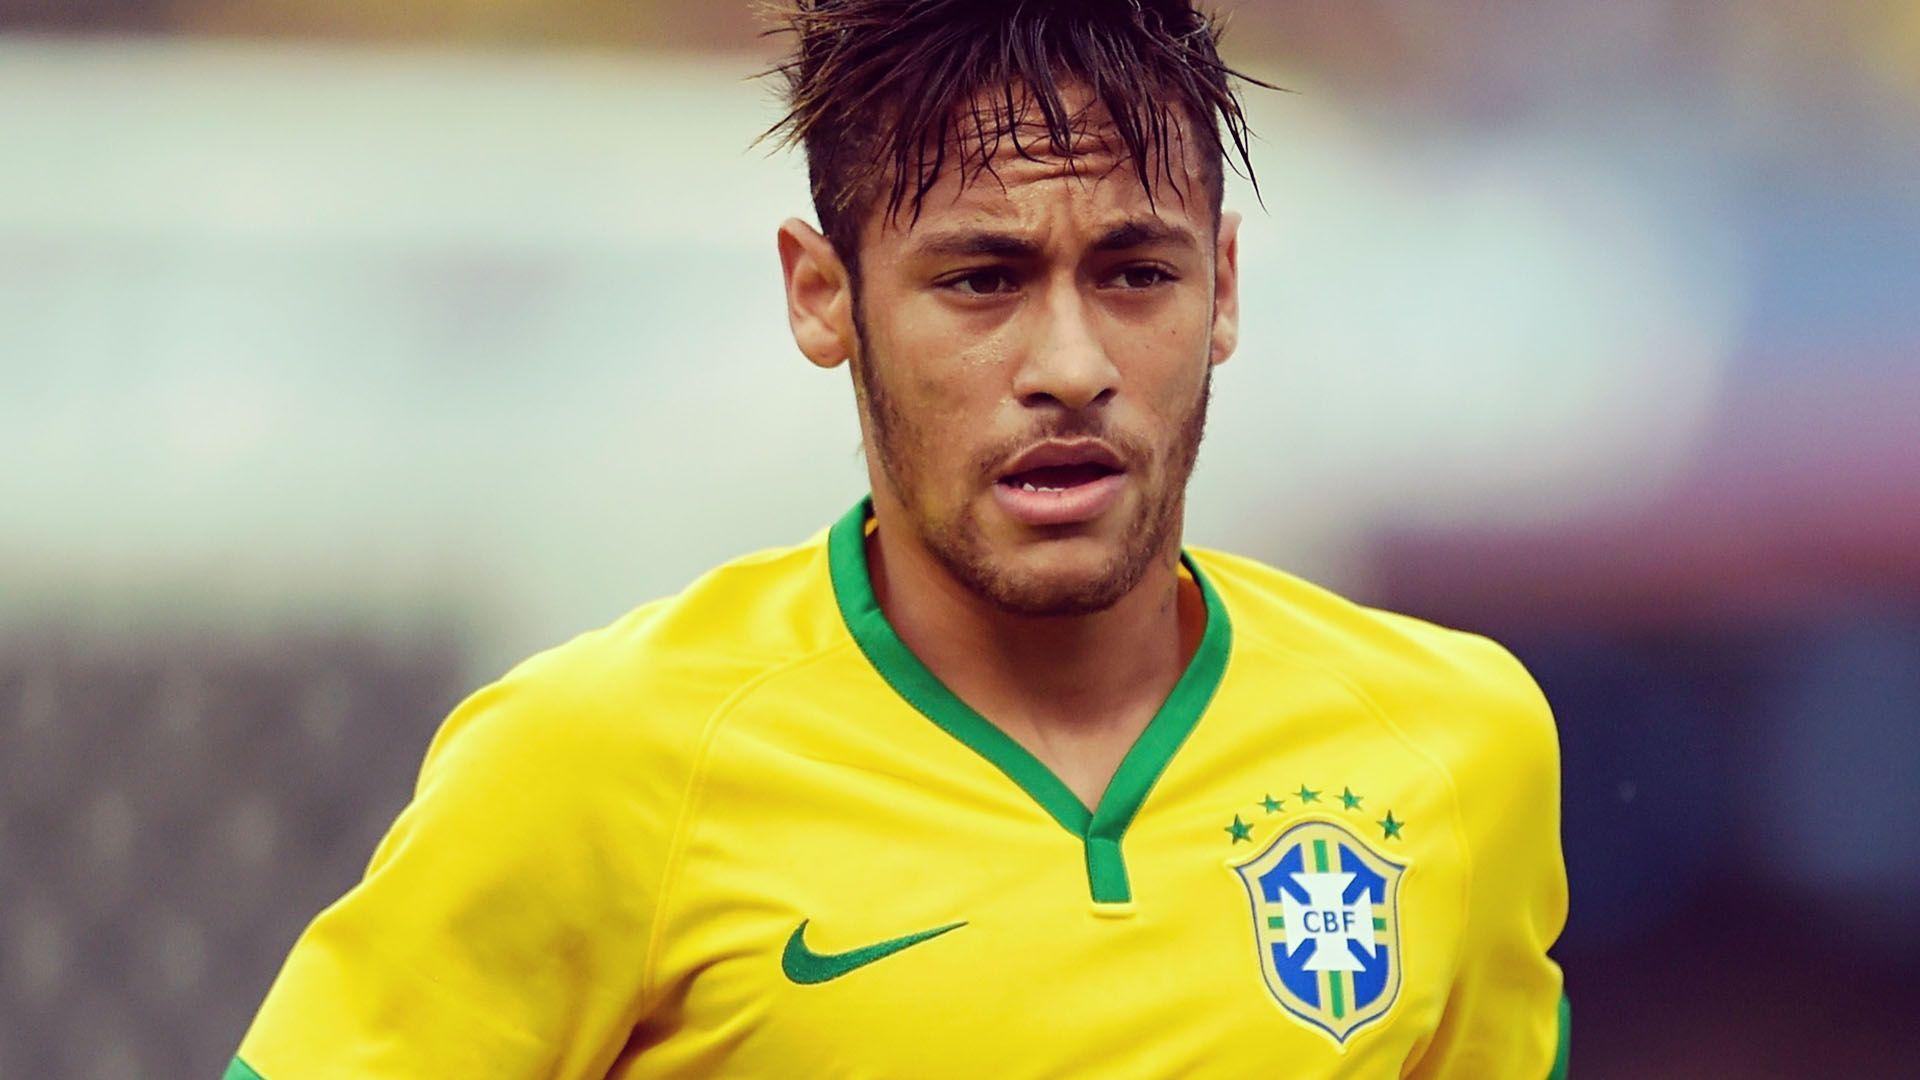 Neymar brazil wallpapers 2016 hd wallpaper cave - Neymar brazil hd ...